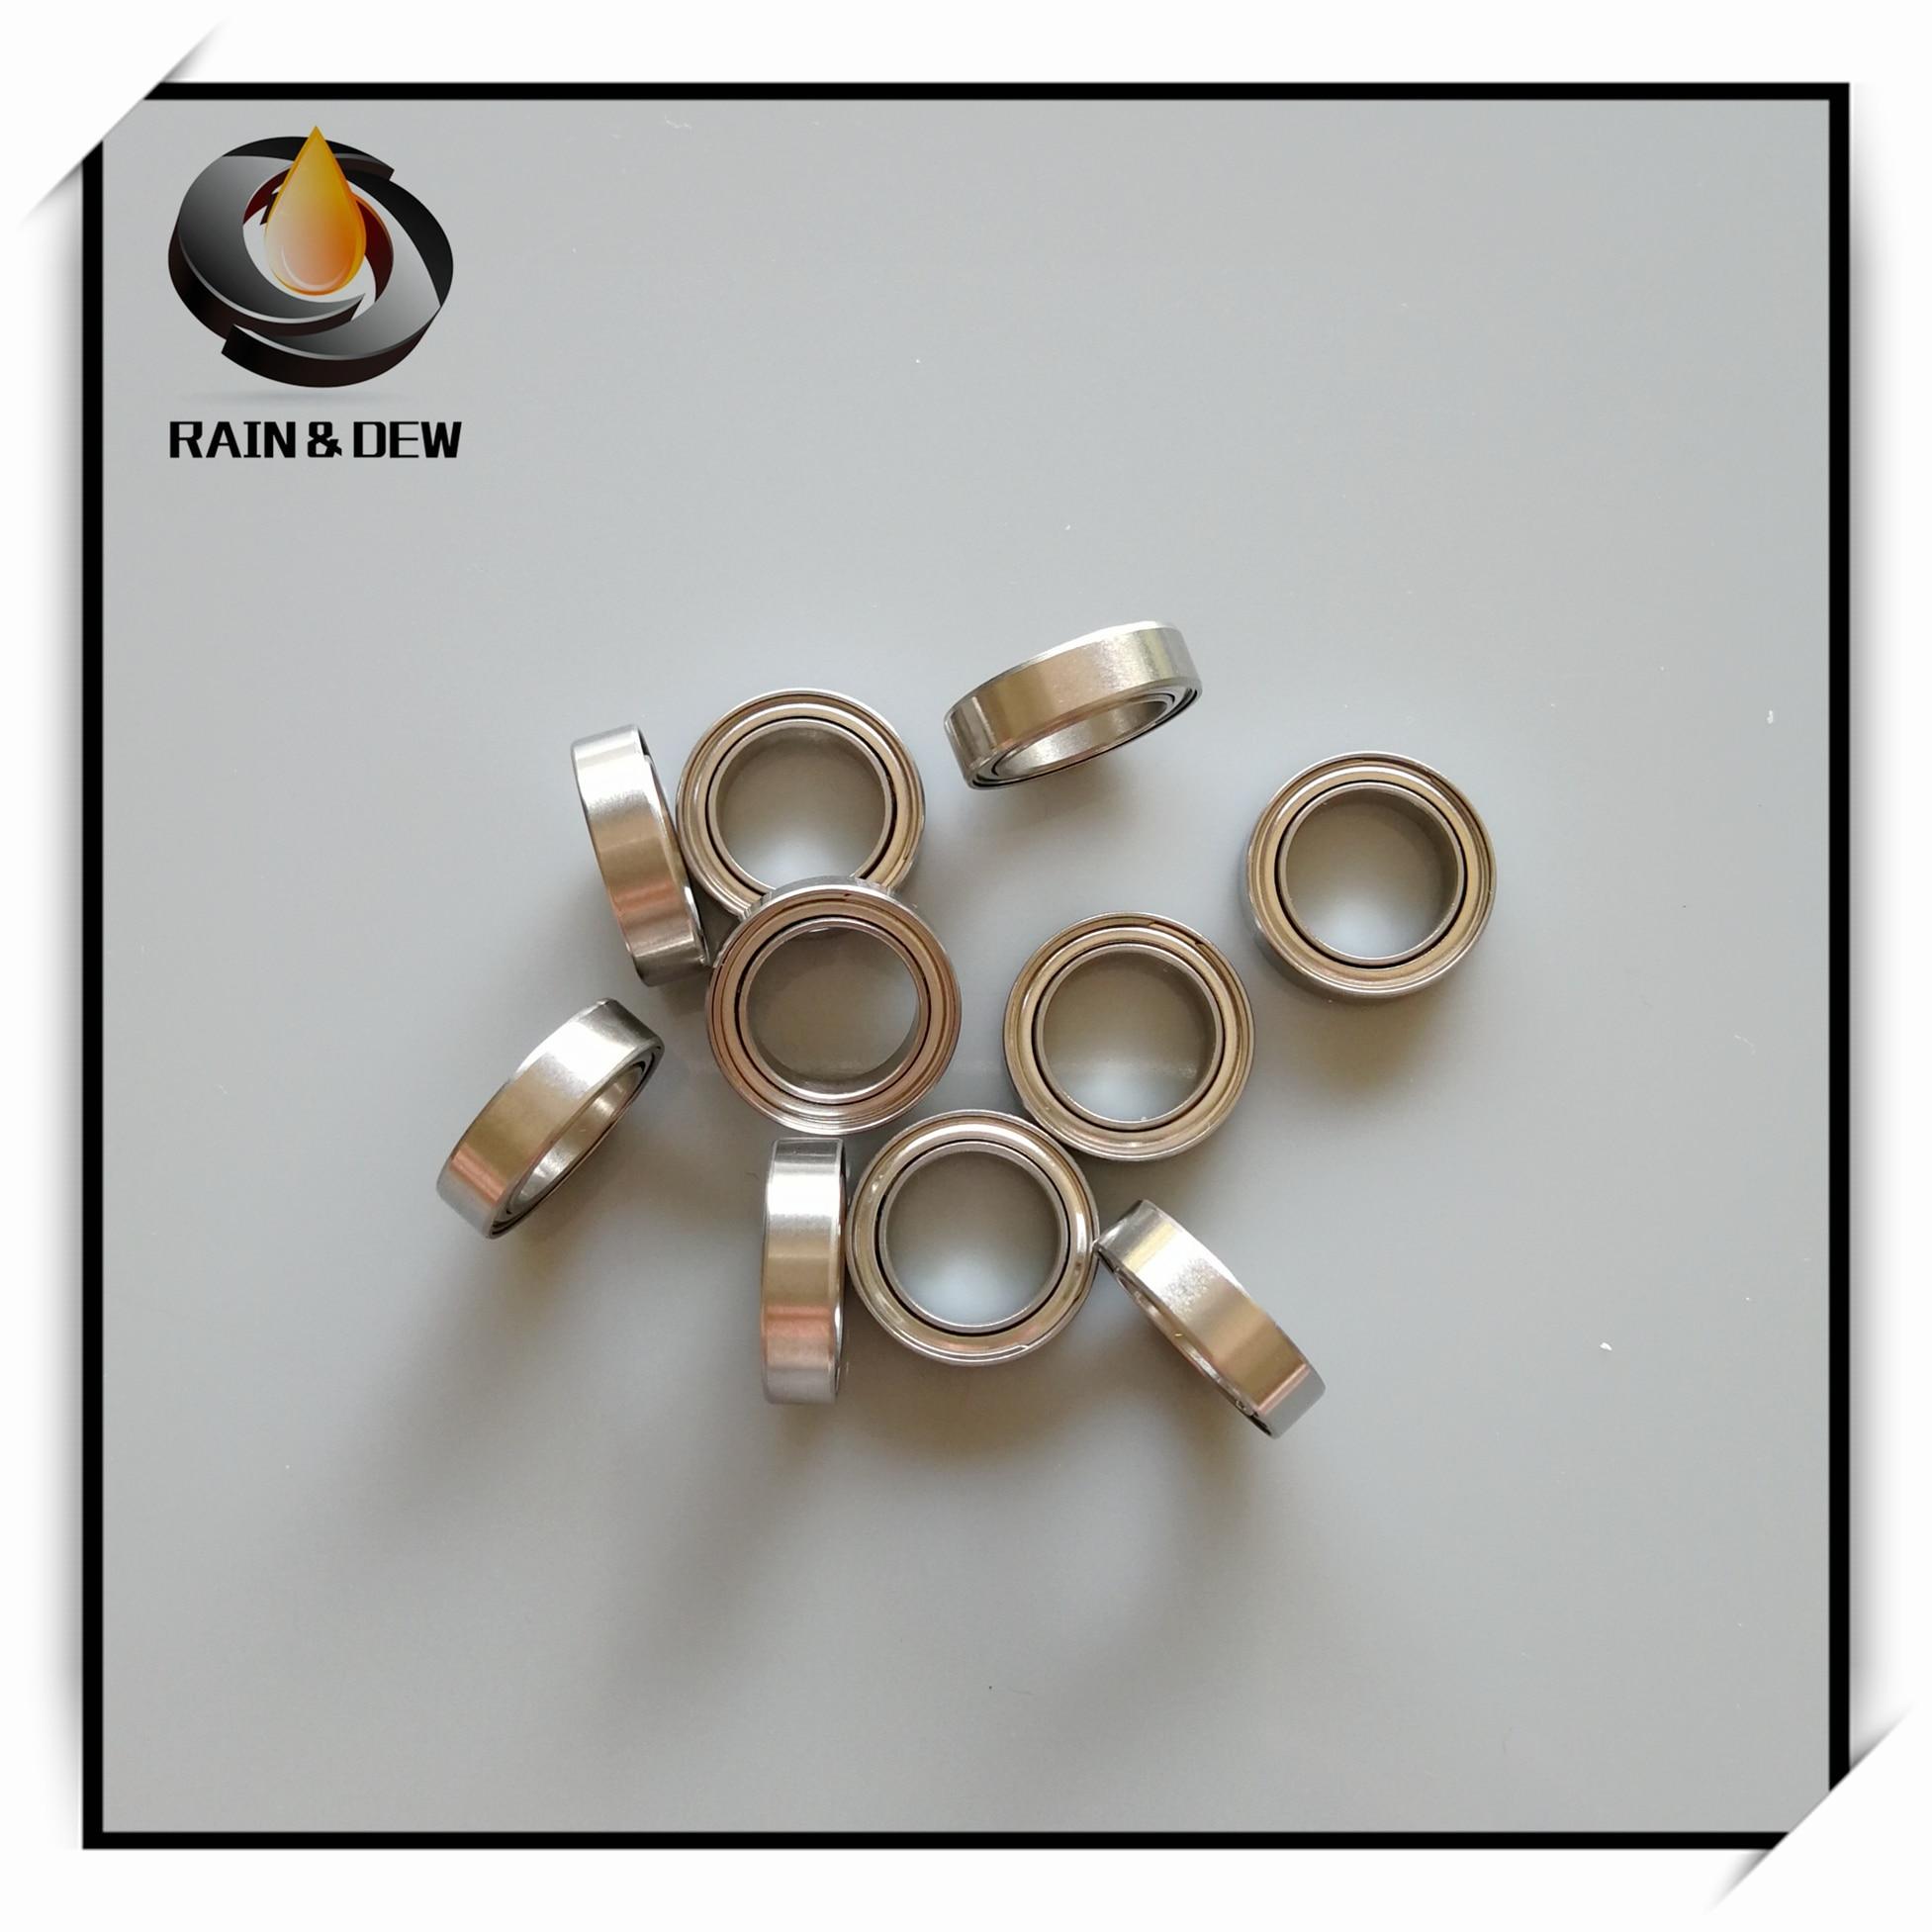 1Pcs  S6701ZZ CB ABEC7 12X18X4 mm 6701 Stainless steel hybrid ceramic ball bearing  Brushless motor bearing RC model bearing